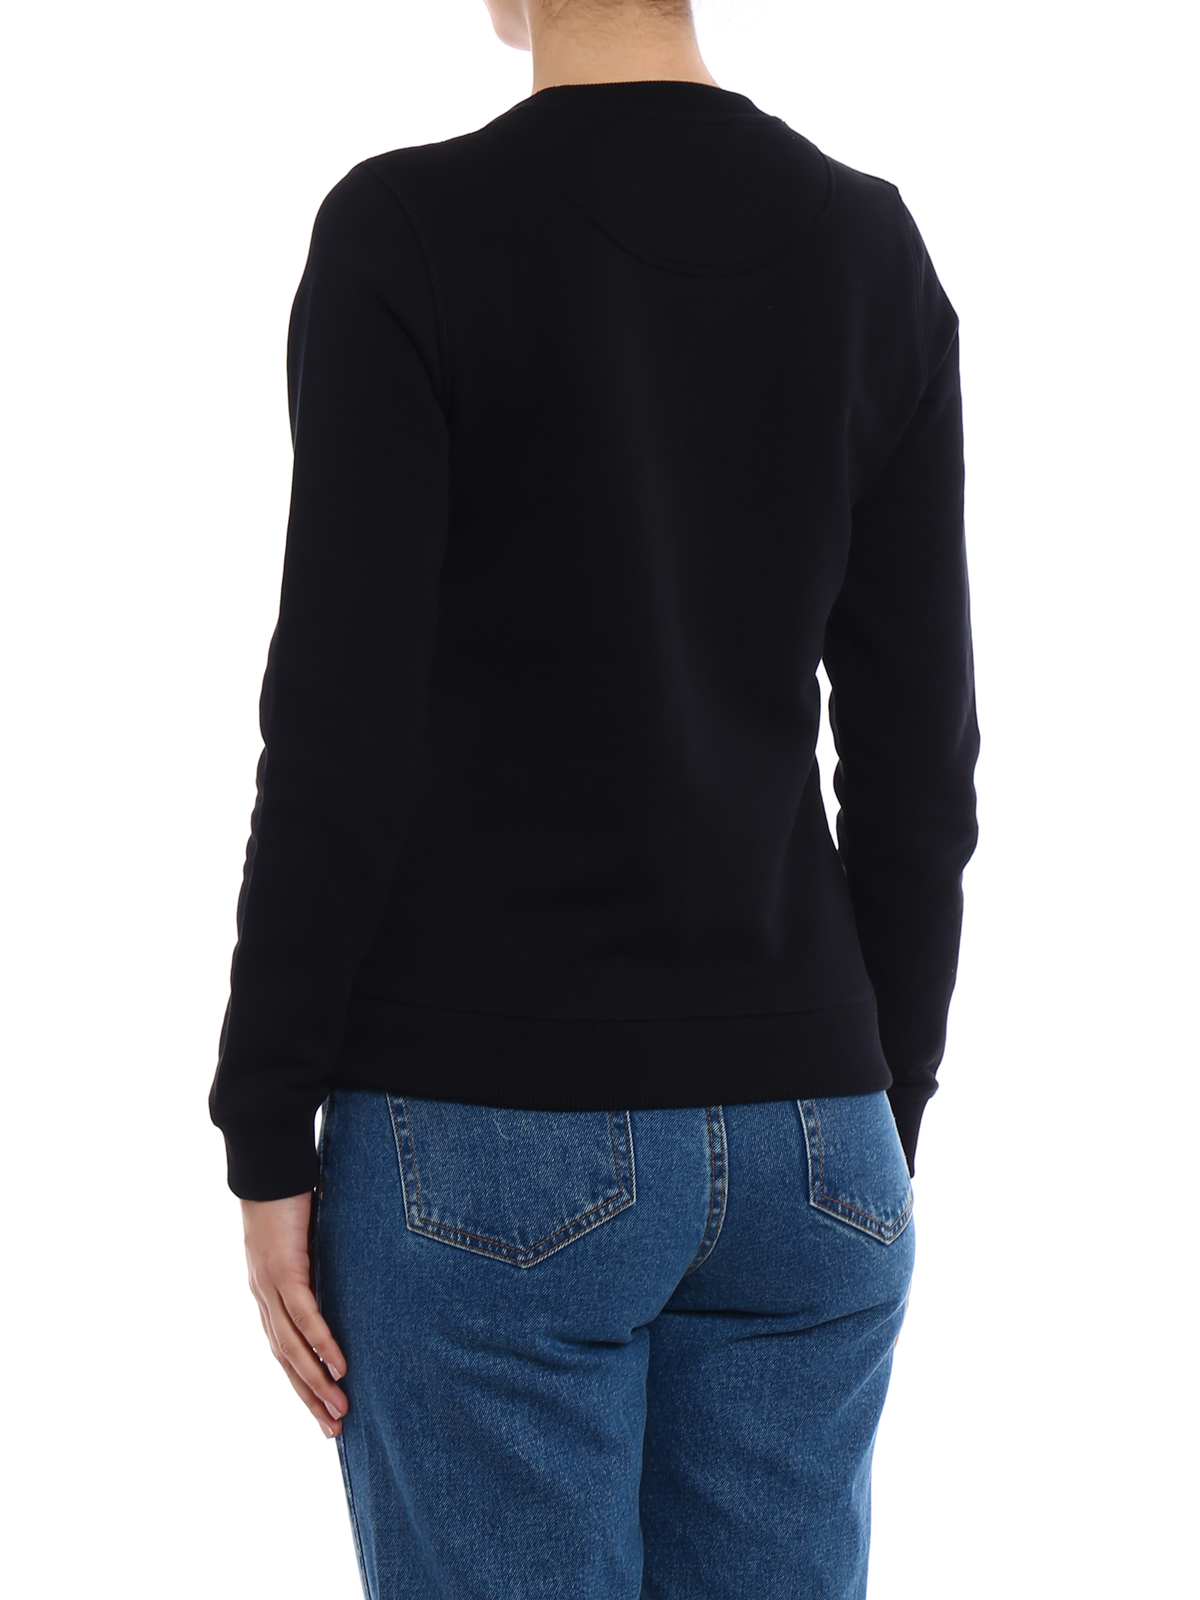 all black kenzo sweater